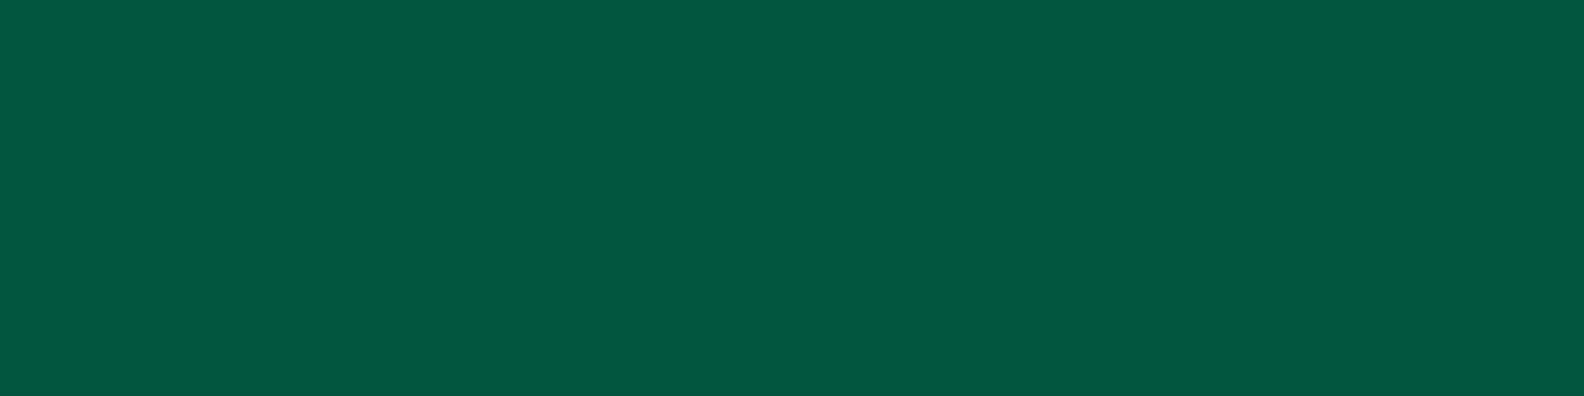 1584x396 Castleton Green Solid Color Background